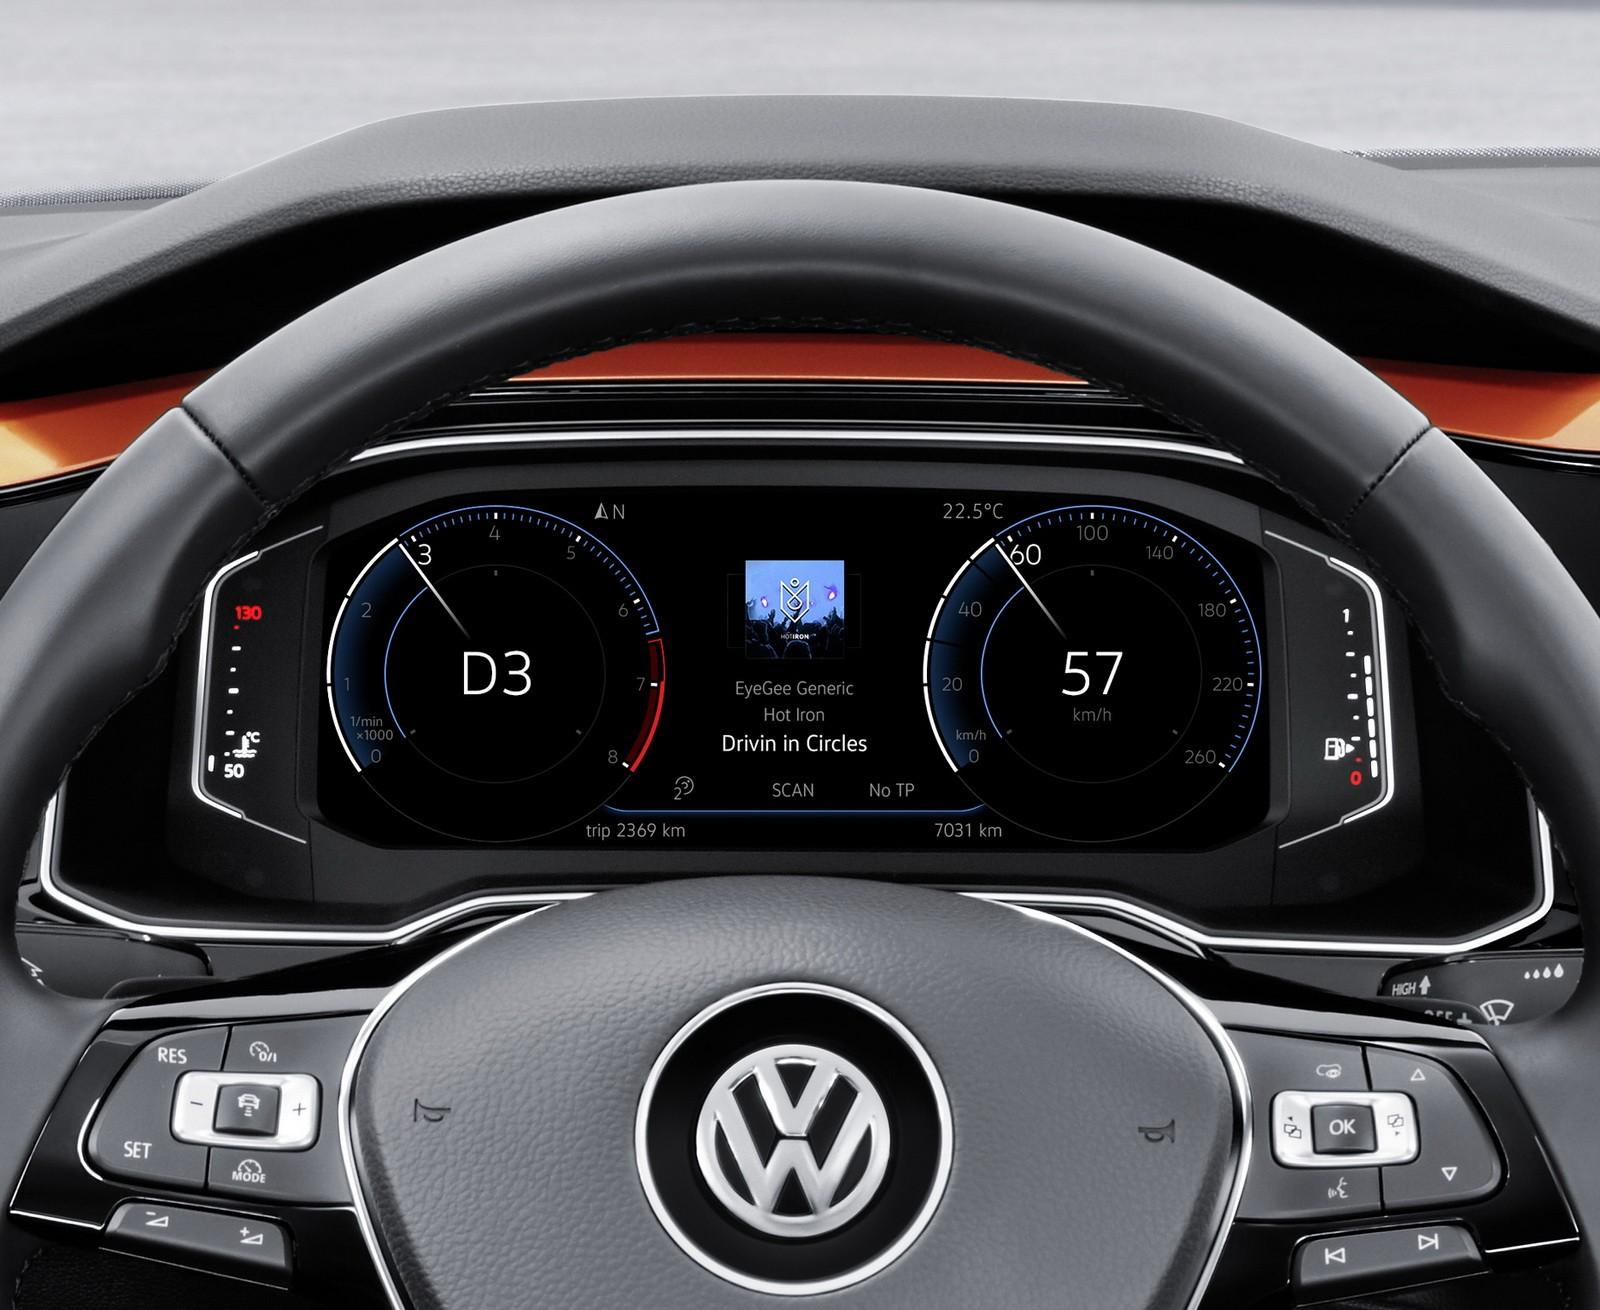 Mini Cooper Evolution >> New 2018 Volkswagen Polo Revealed, Has Coolest Dash Ever and 200 HP GTI - autoevolution